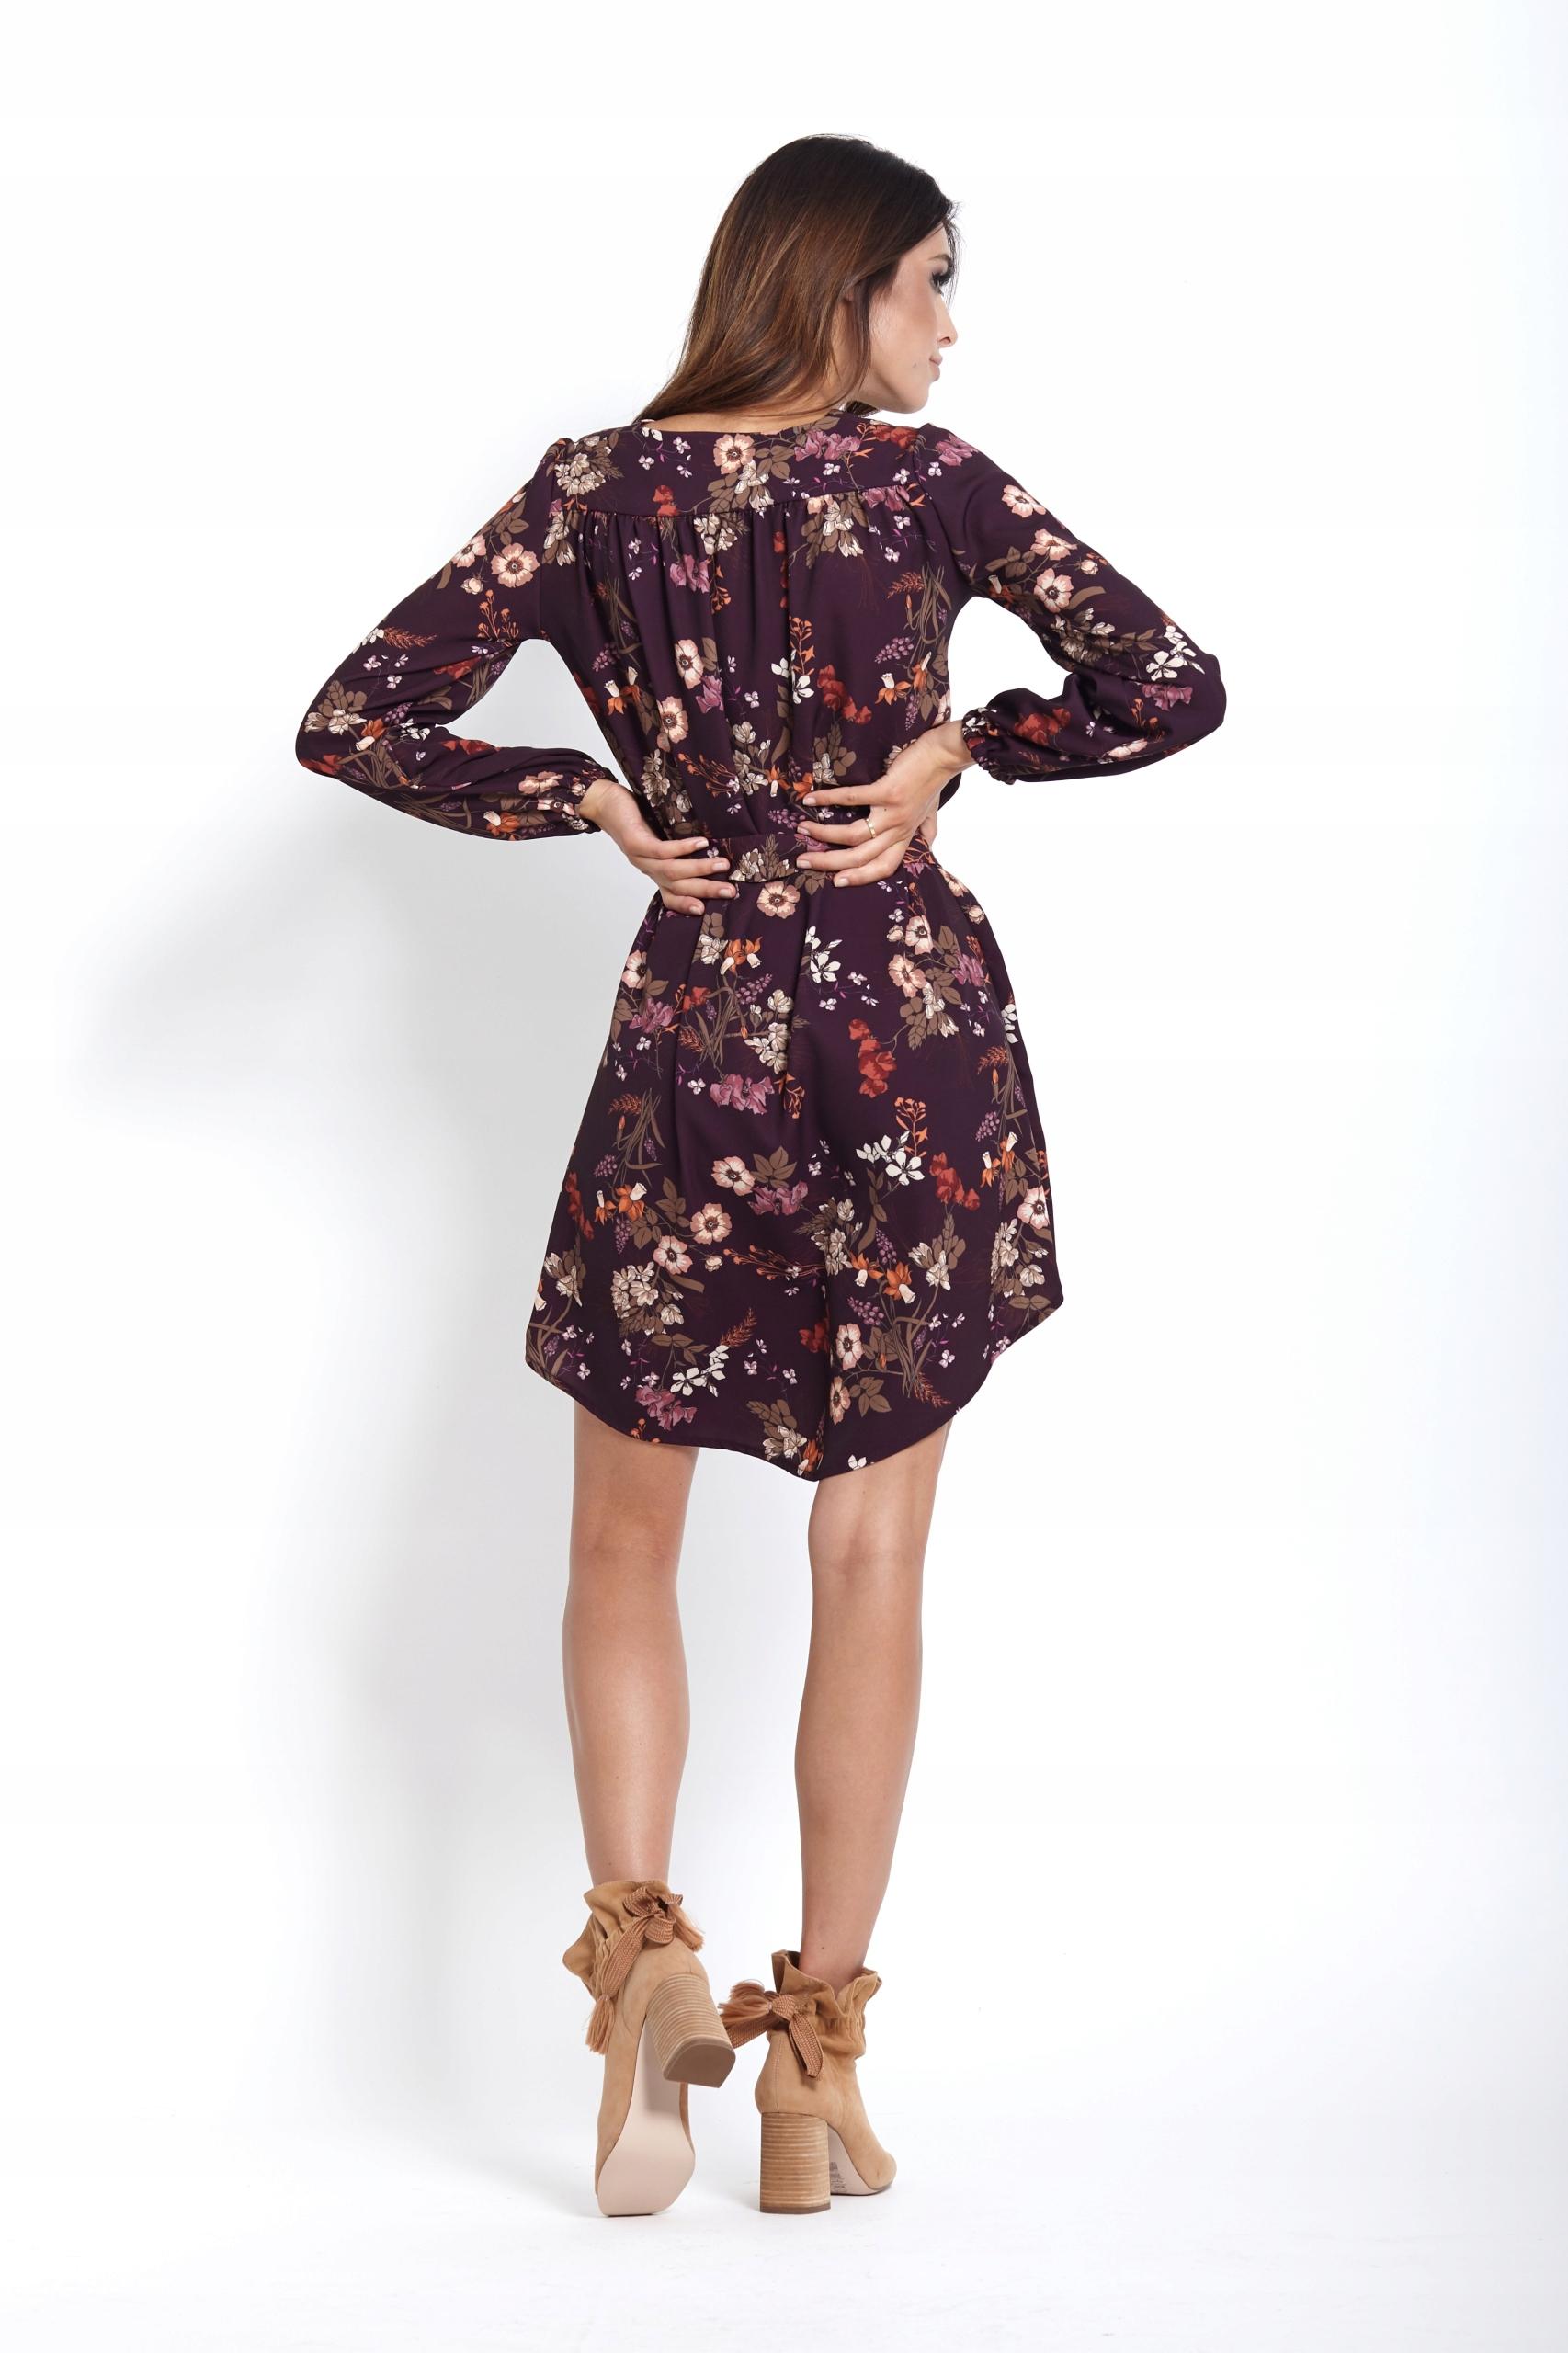 7d71d749b2 Sukienka o prostym kroju - Karina - kwiaty S - 7674259452 ...